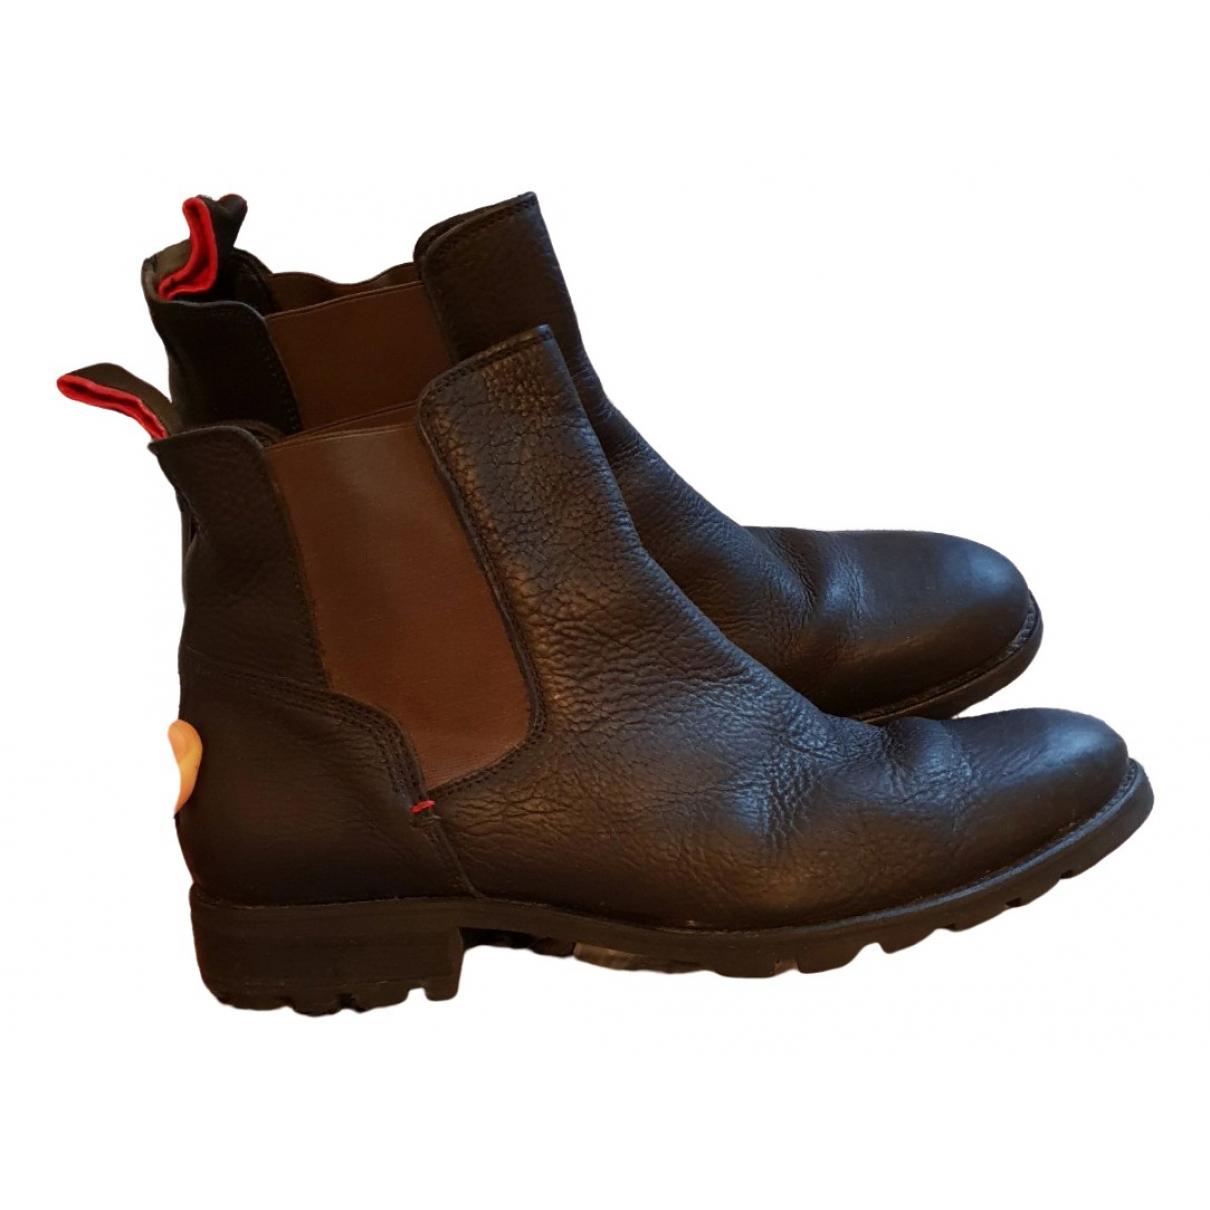 Tommy Hilfiger \N Multicolour Leather Boots for Men 44 EU